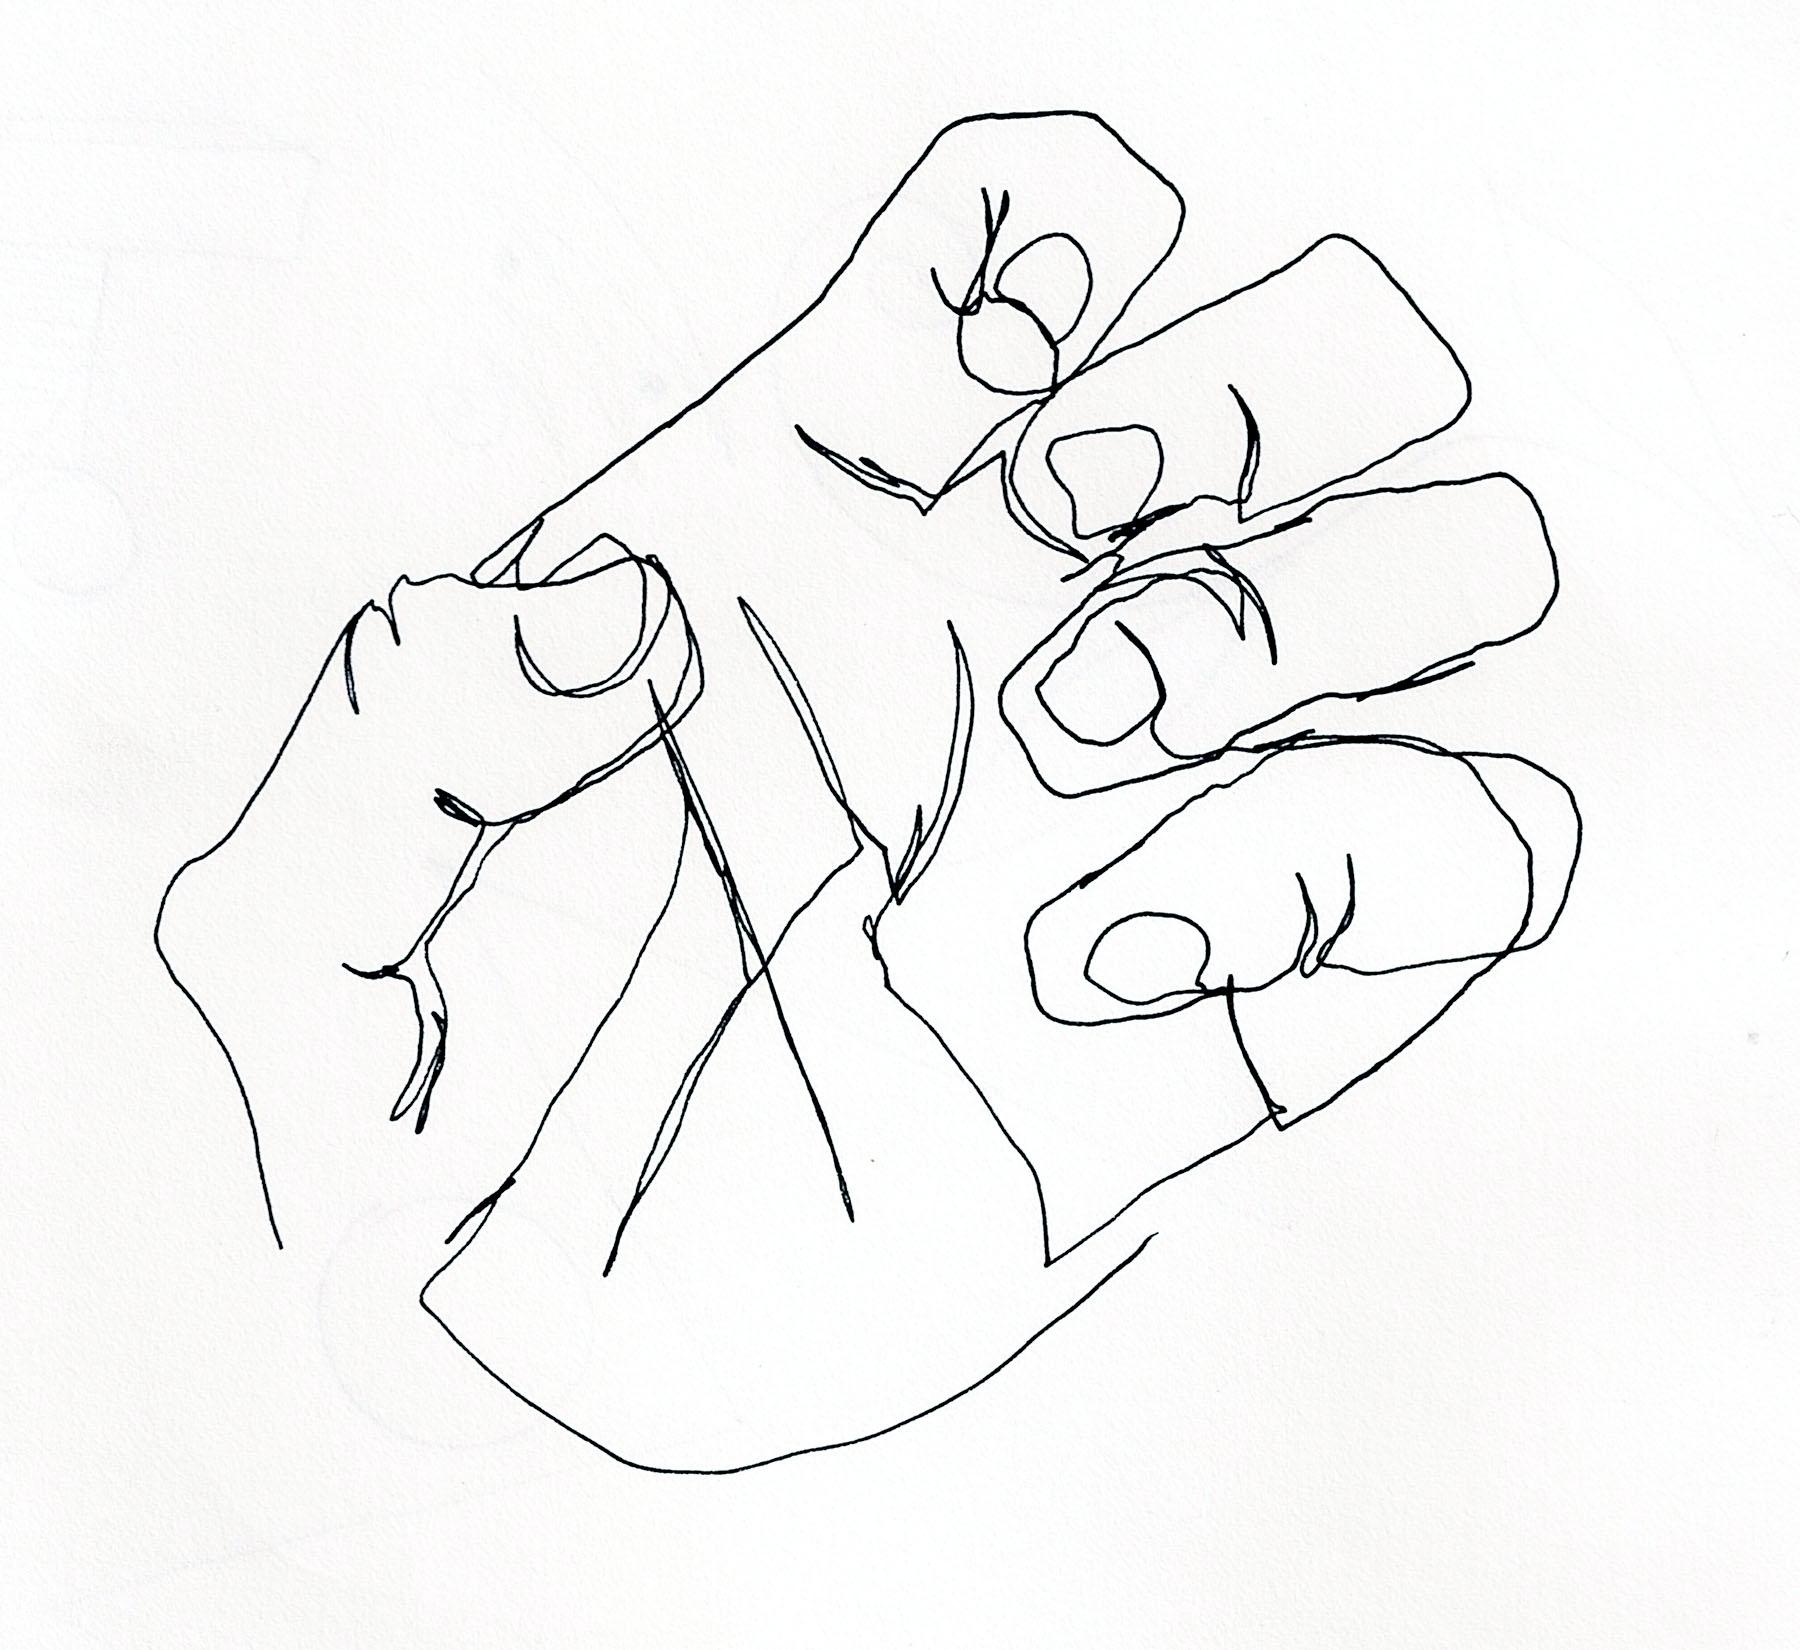 Contour Line Drawing Hand Brian Cho